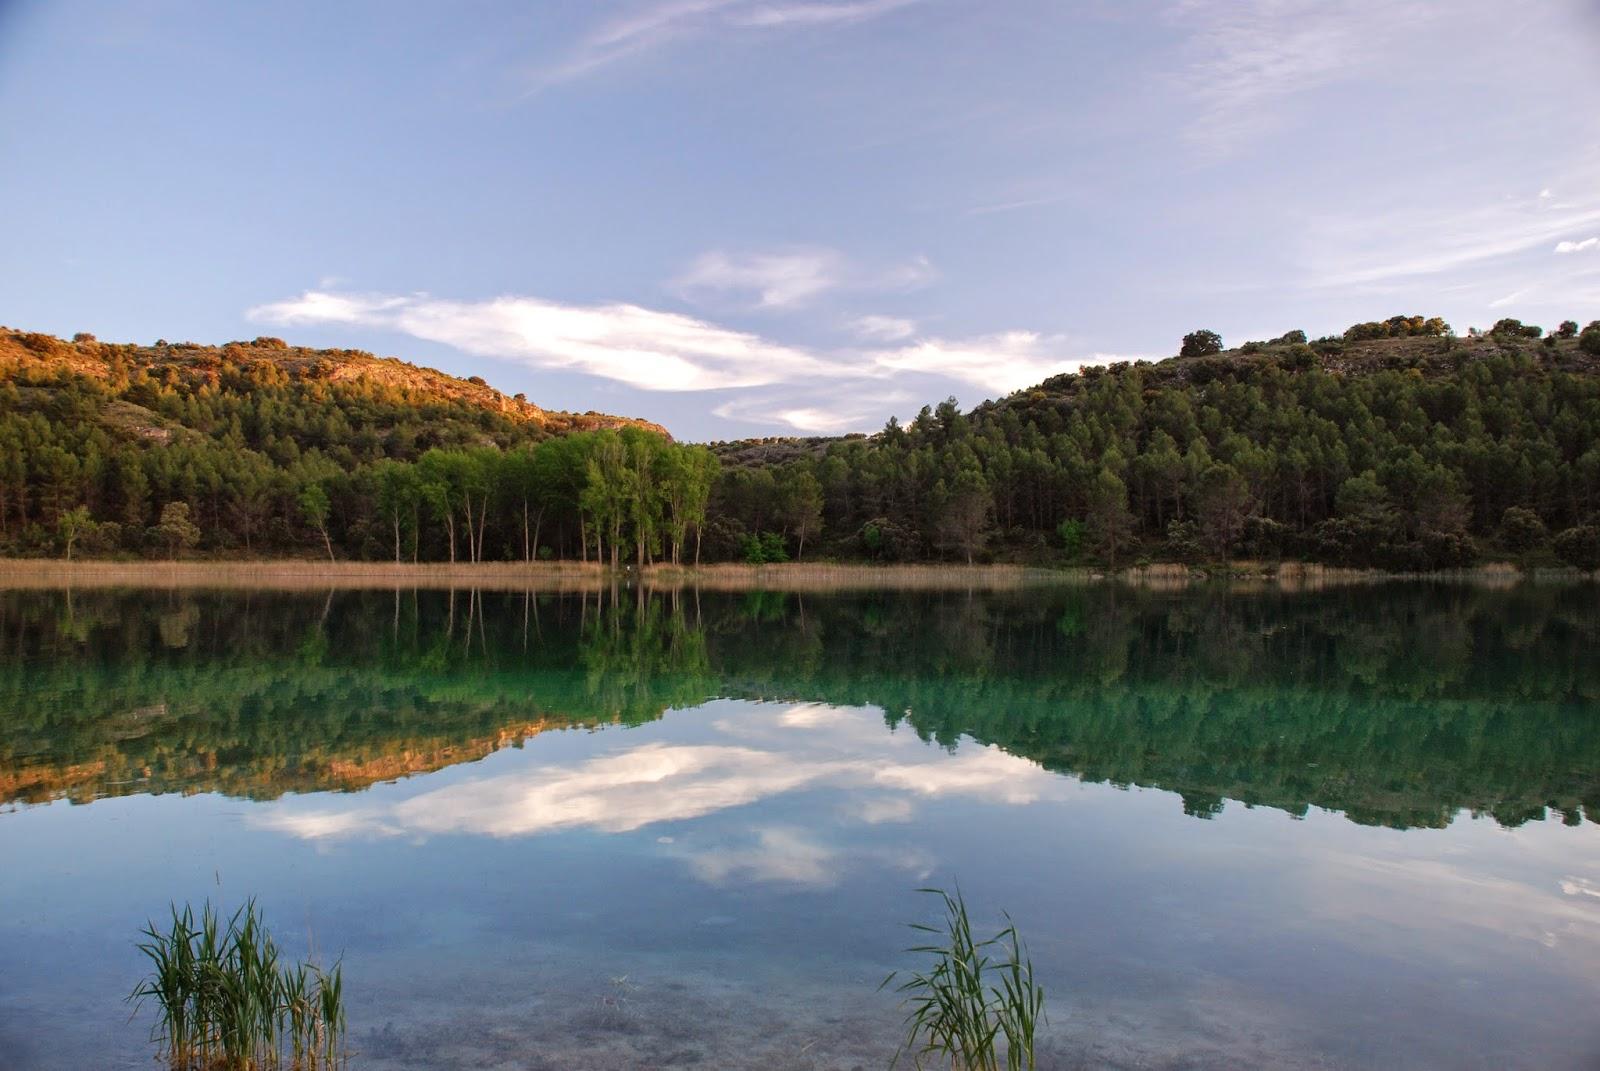 Laguna Santos Morcillo, Laguna de Ruidera